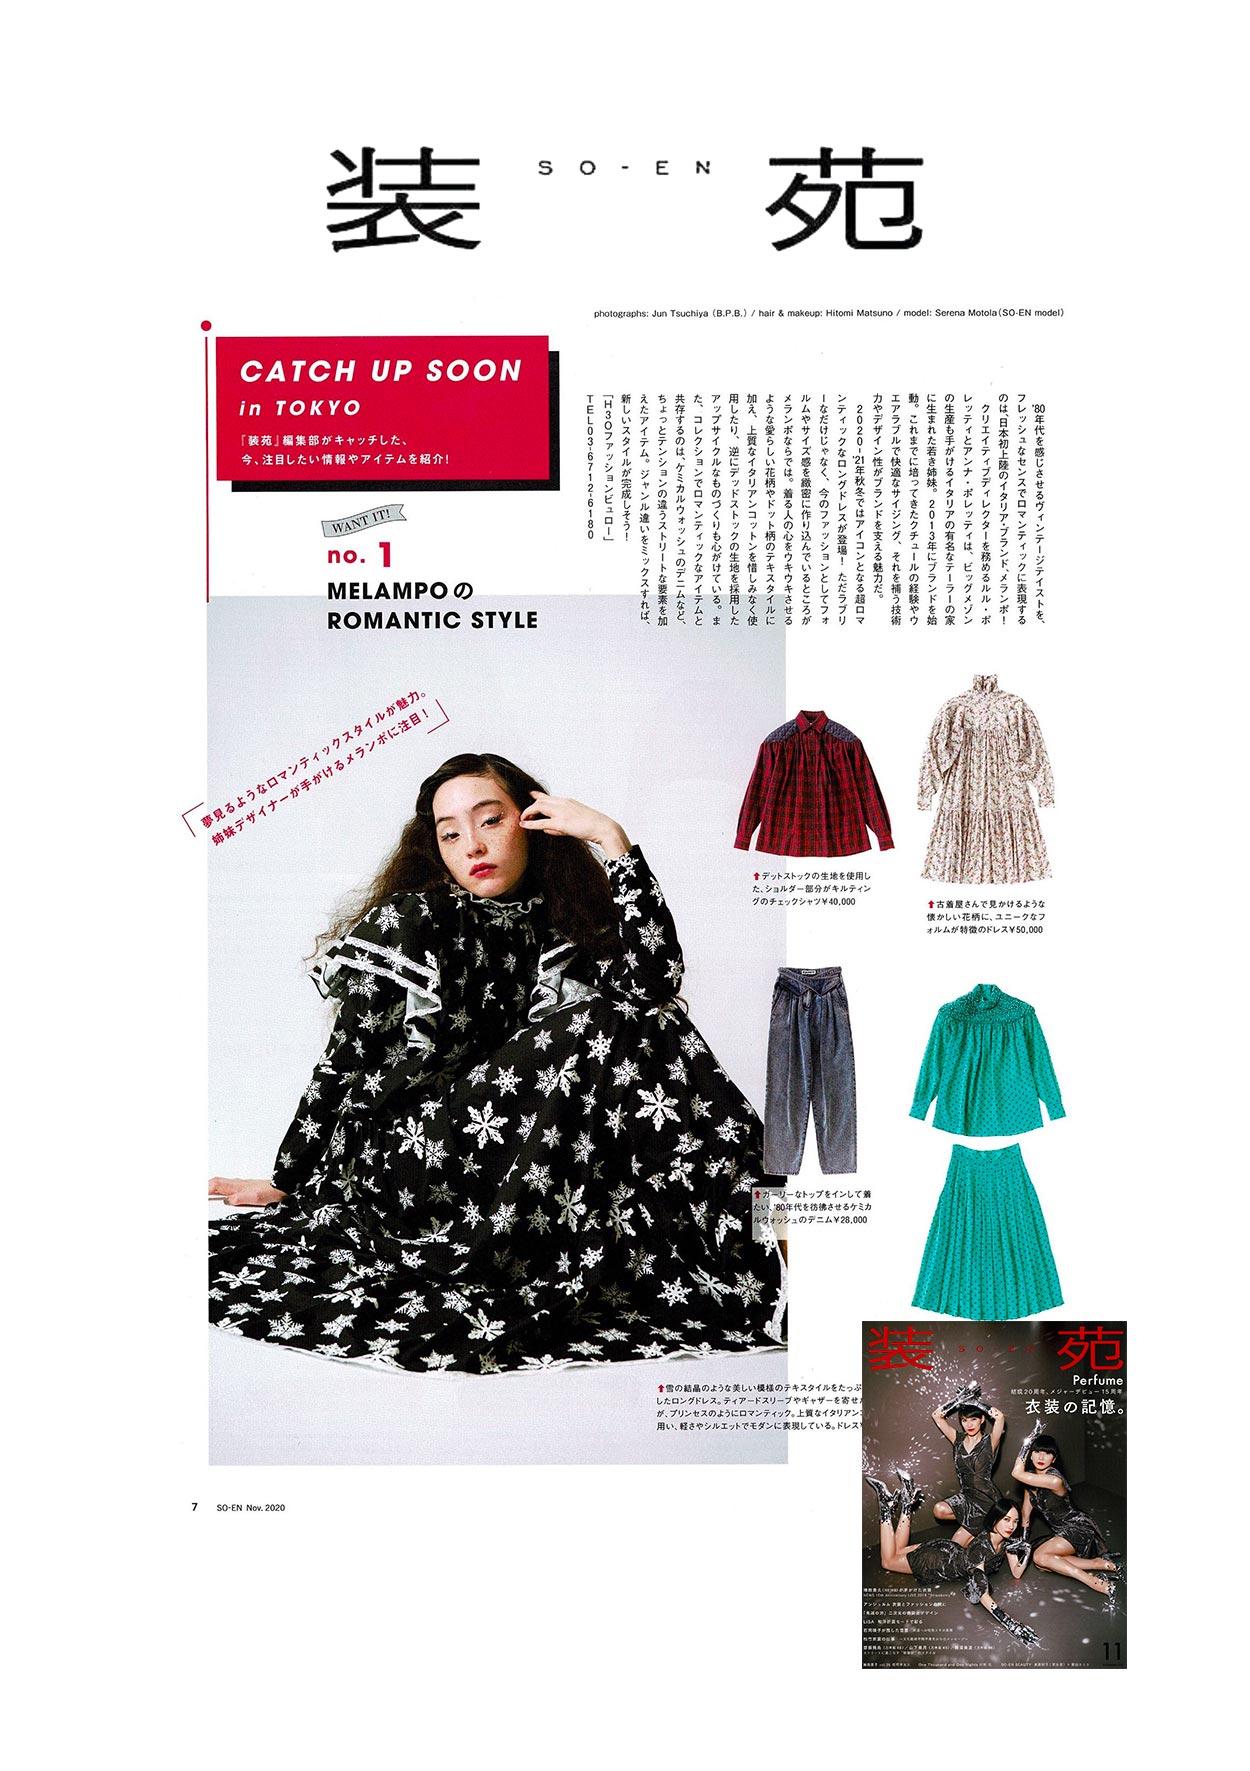 melampo press onto-en Japan magazine